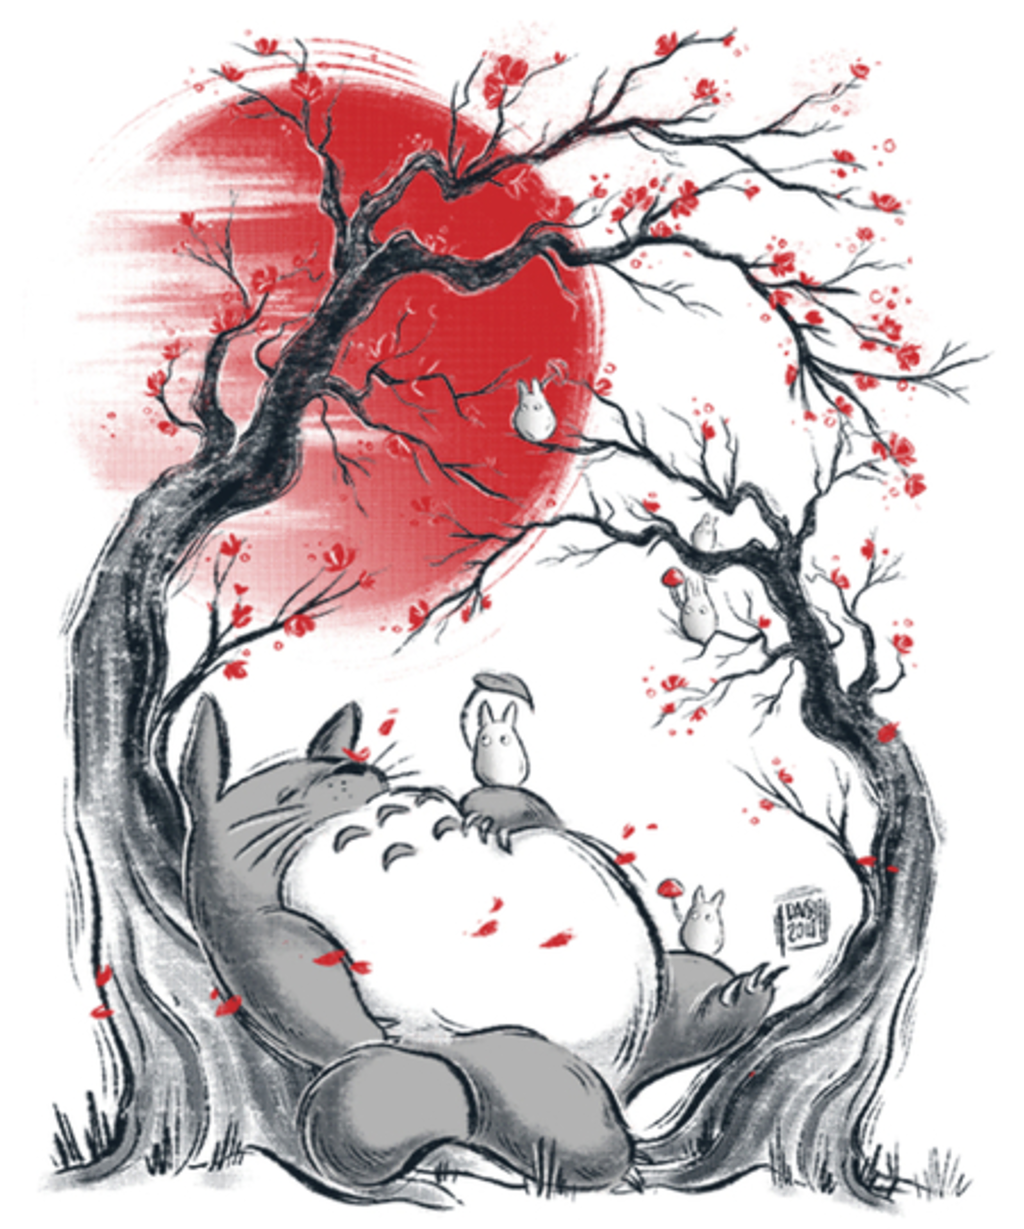 Qwertee: Totoro's dream